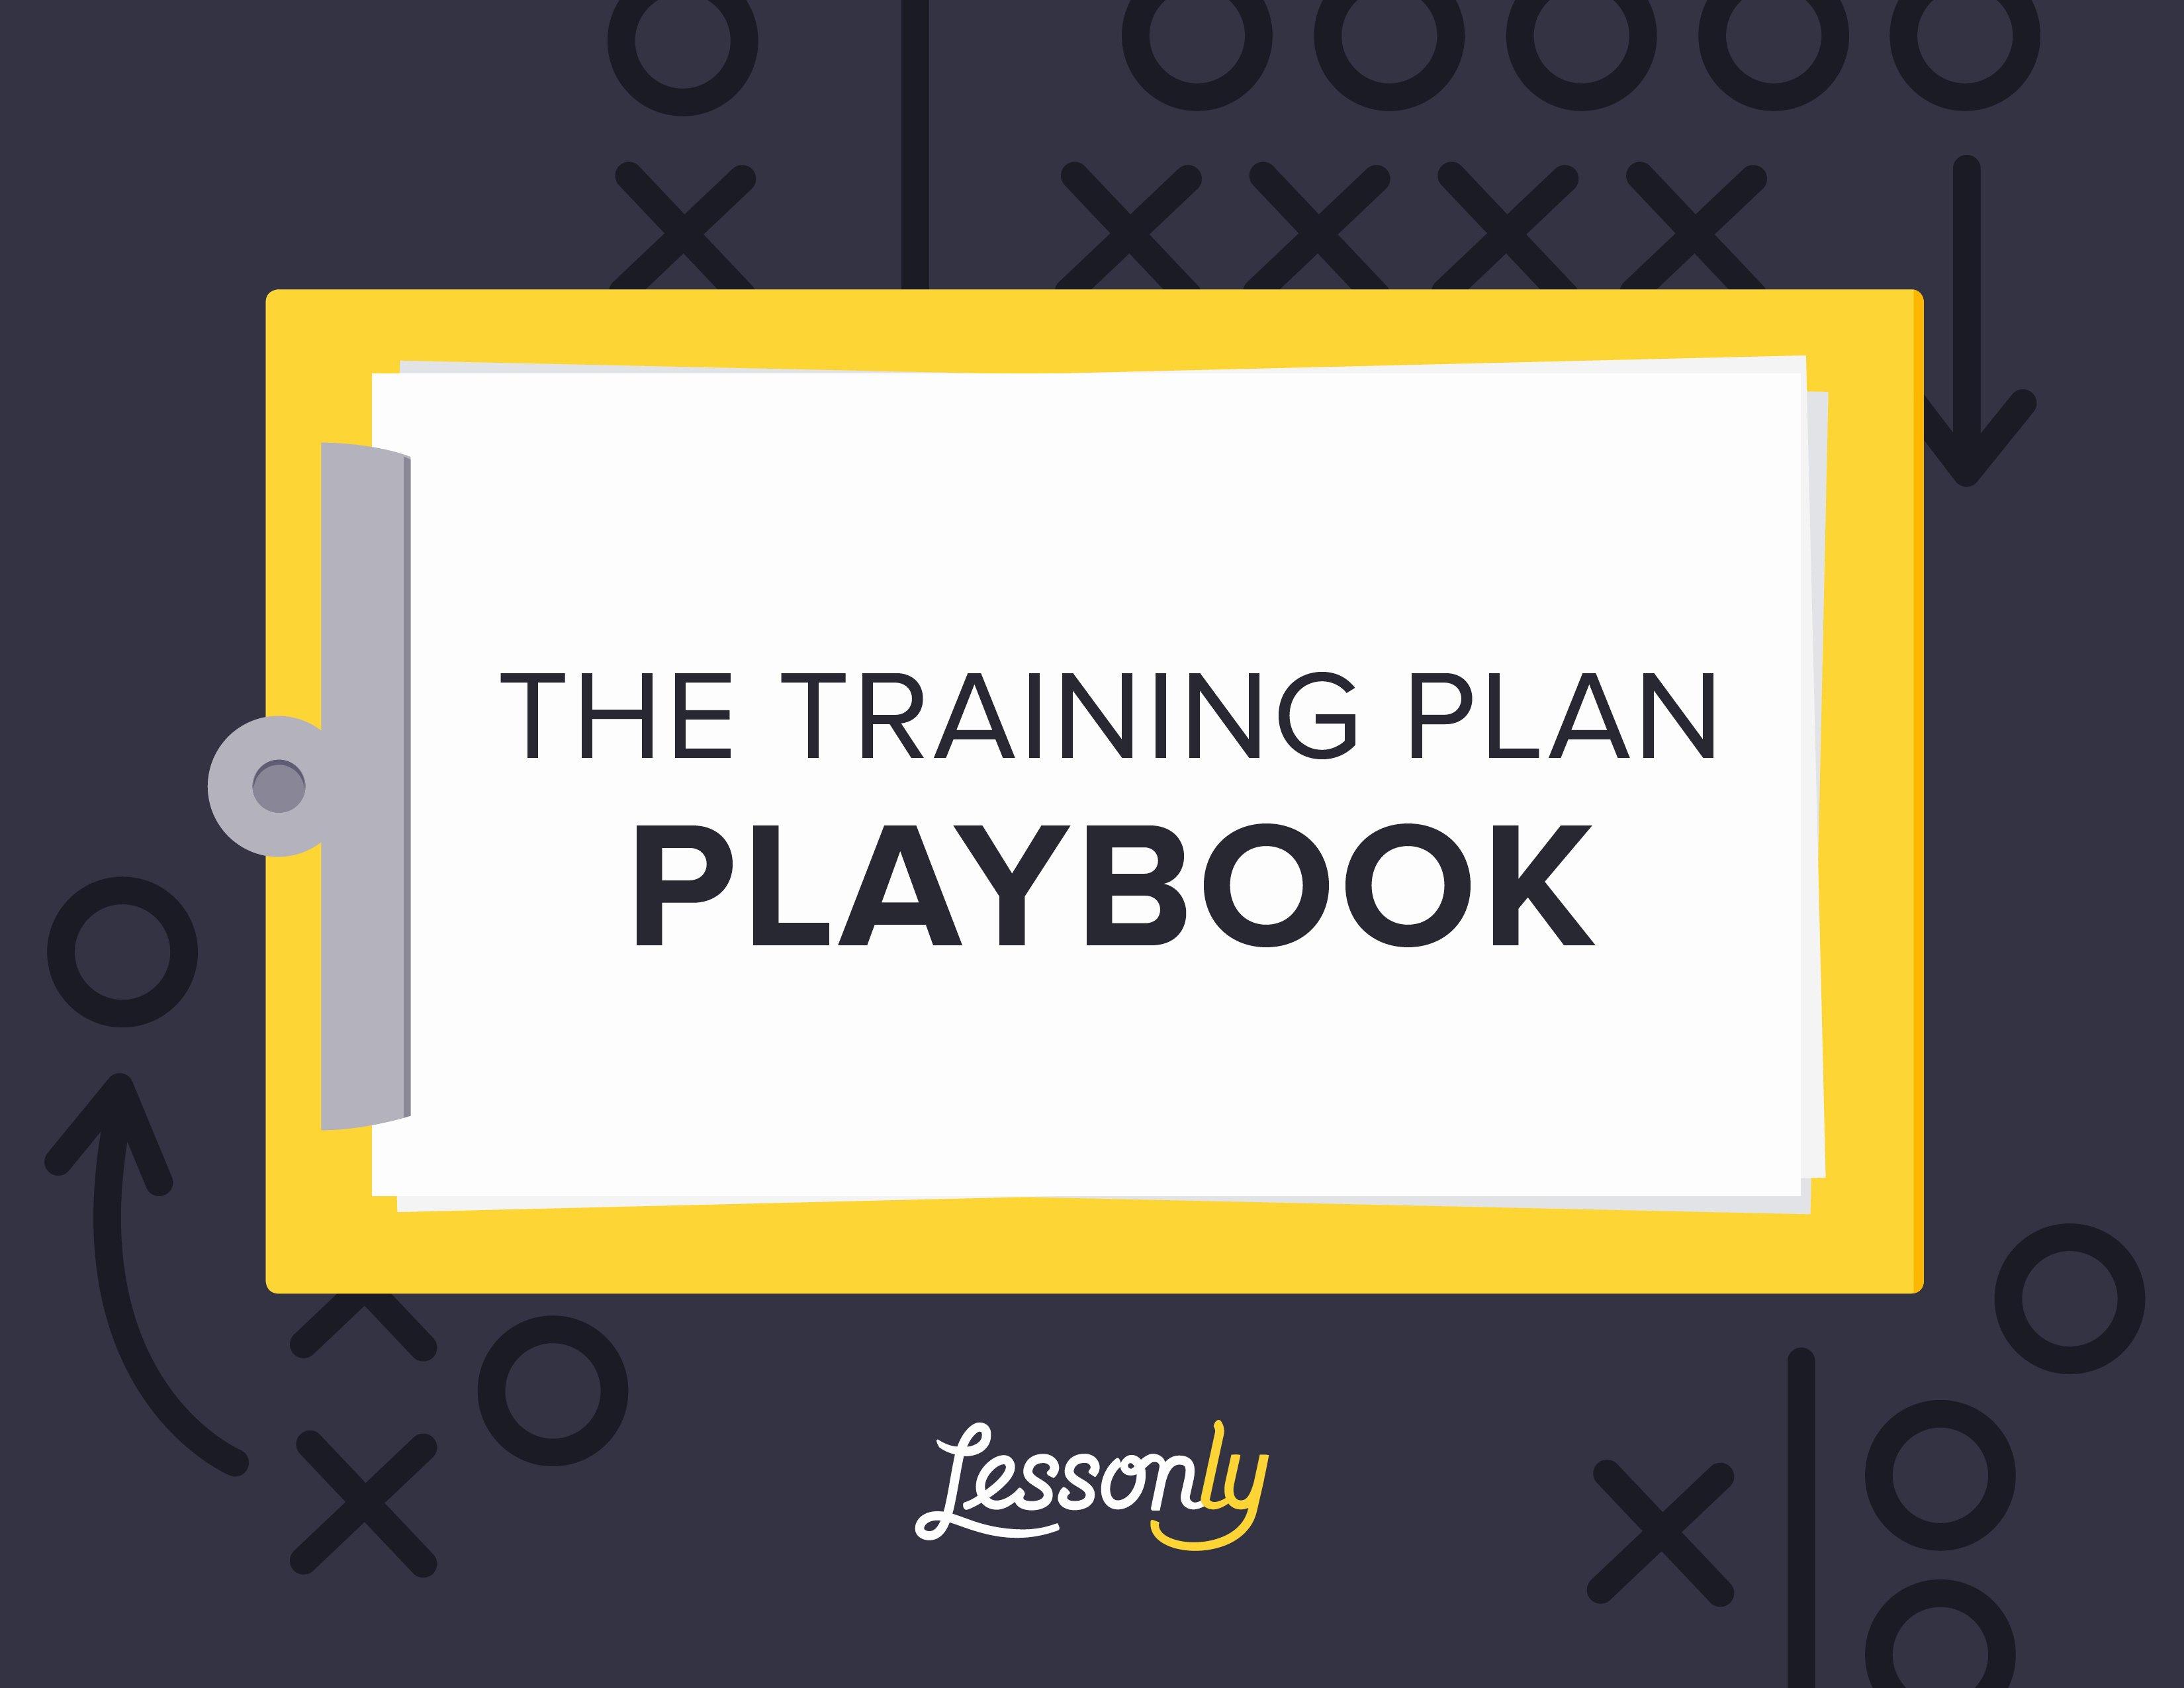 New Employee Training Plan Template New Free Employee Training Playbook